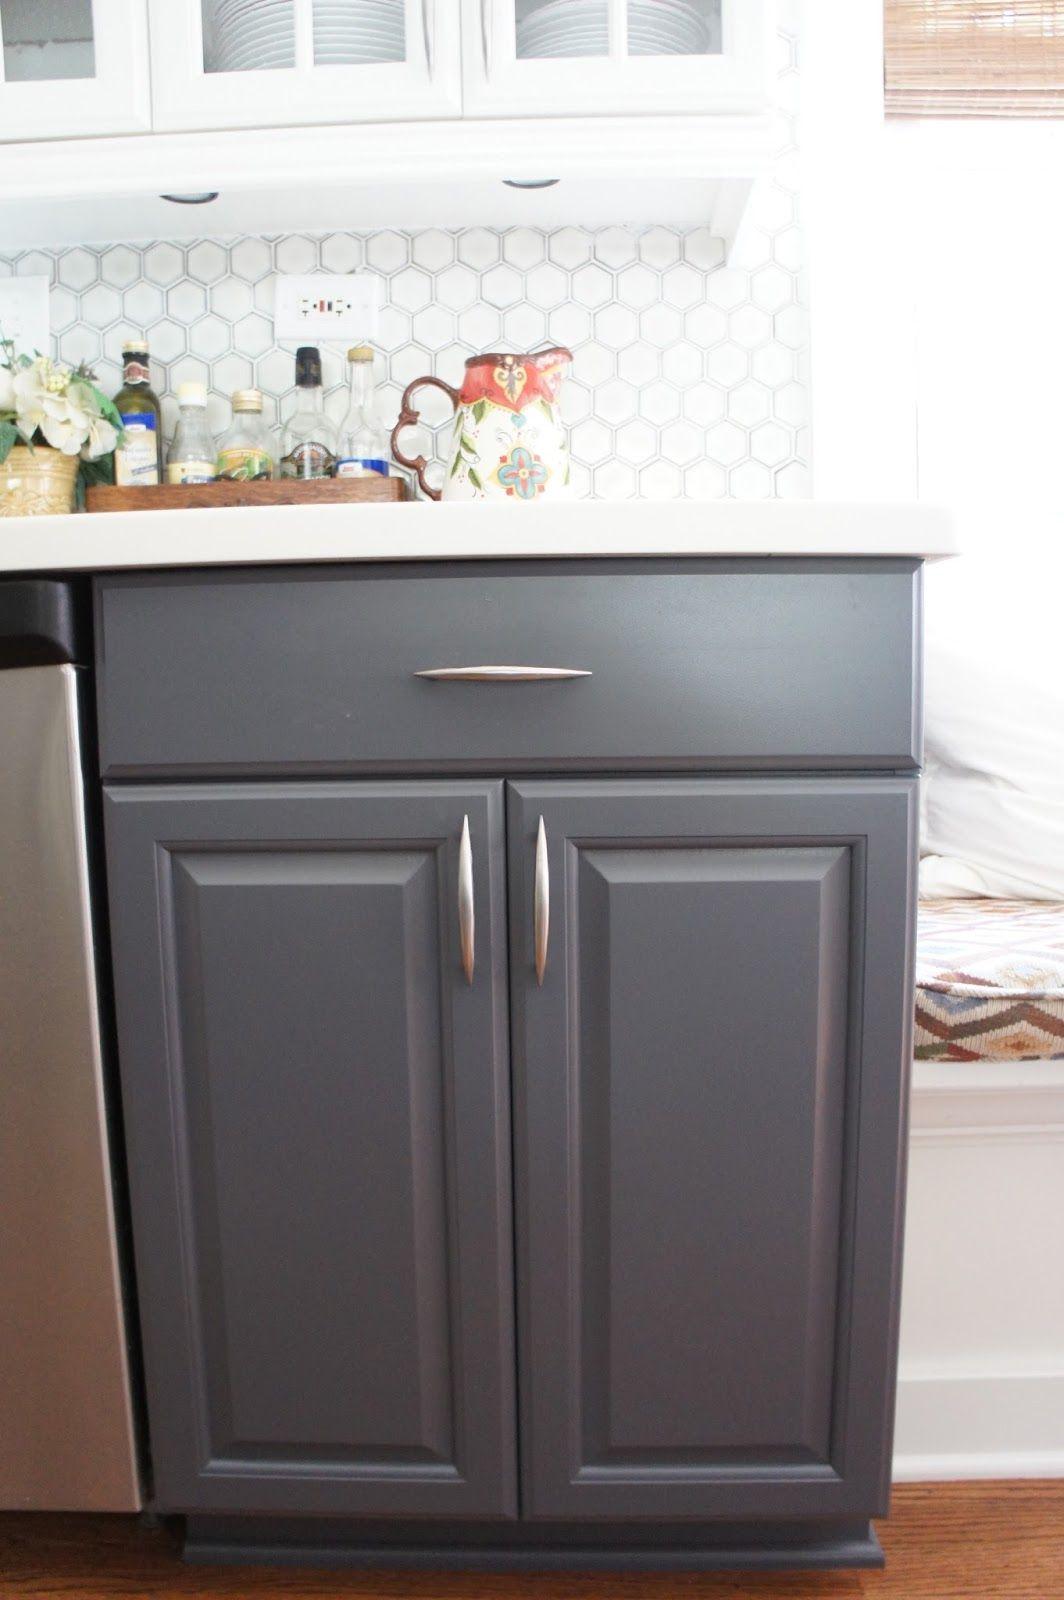 Best Kitchen Gallery: Behr Pencil Point Dining Room Pinterest Behr Kitchen Redo And of Behr Gray Paint For Kitchen Cabinets on rachelxblog.com